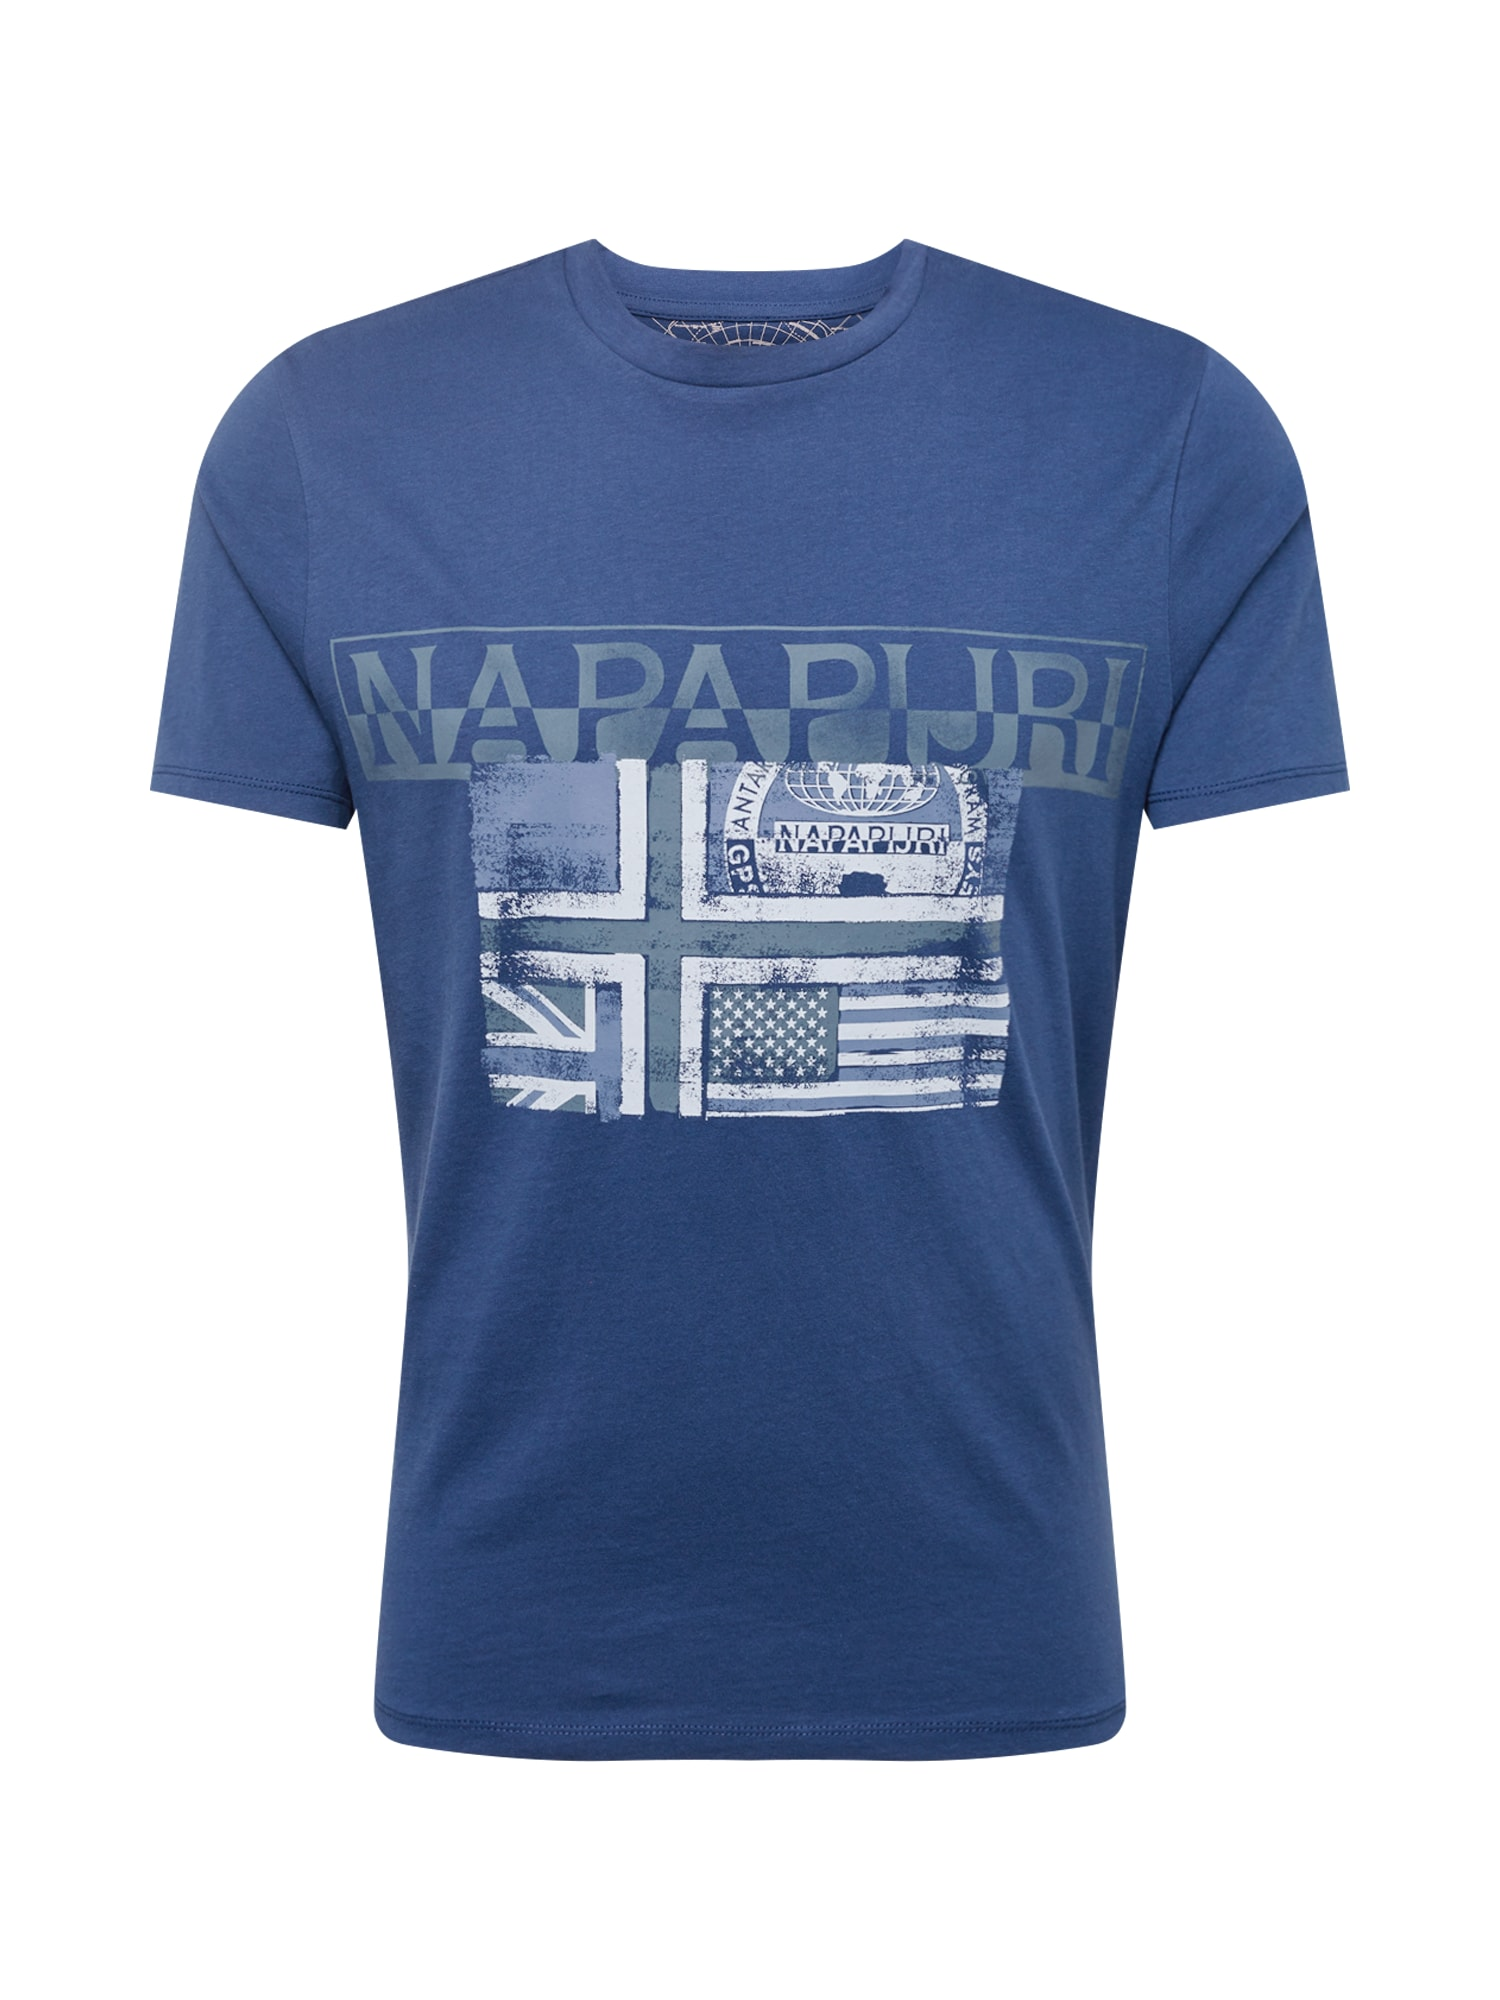 Tričko SAWY tmavě modrá bílá NAPAPIJRI